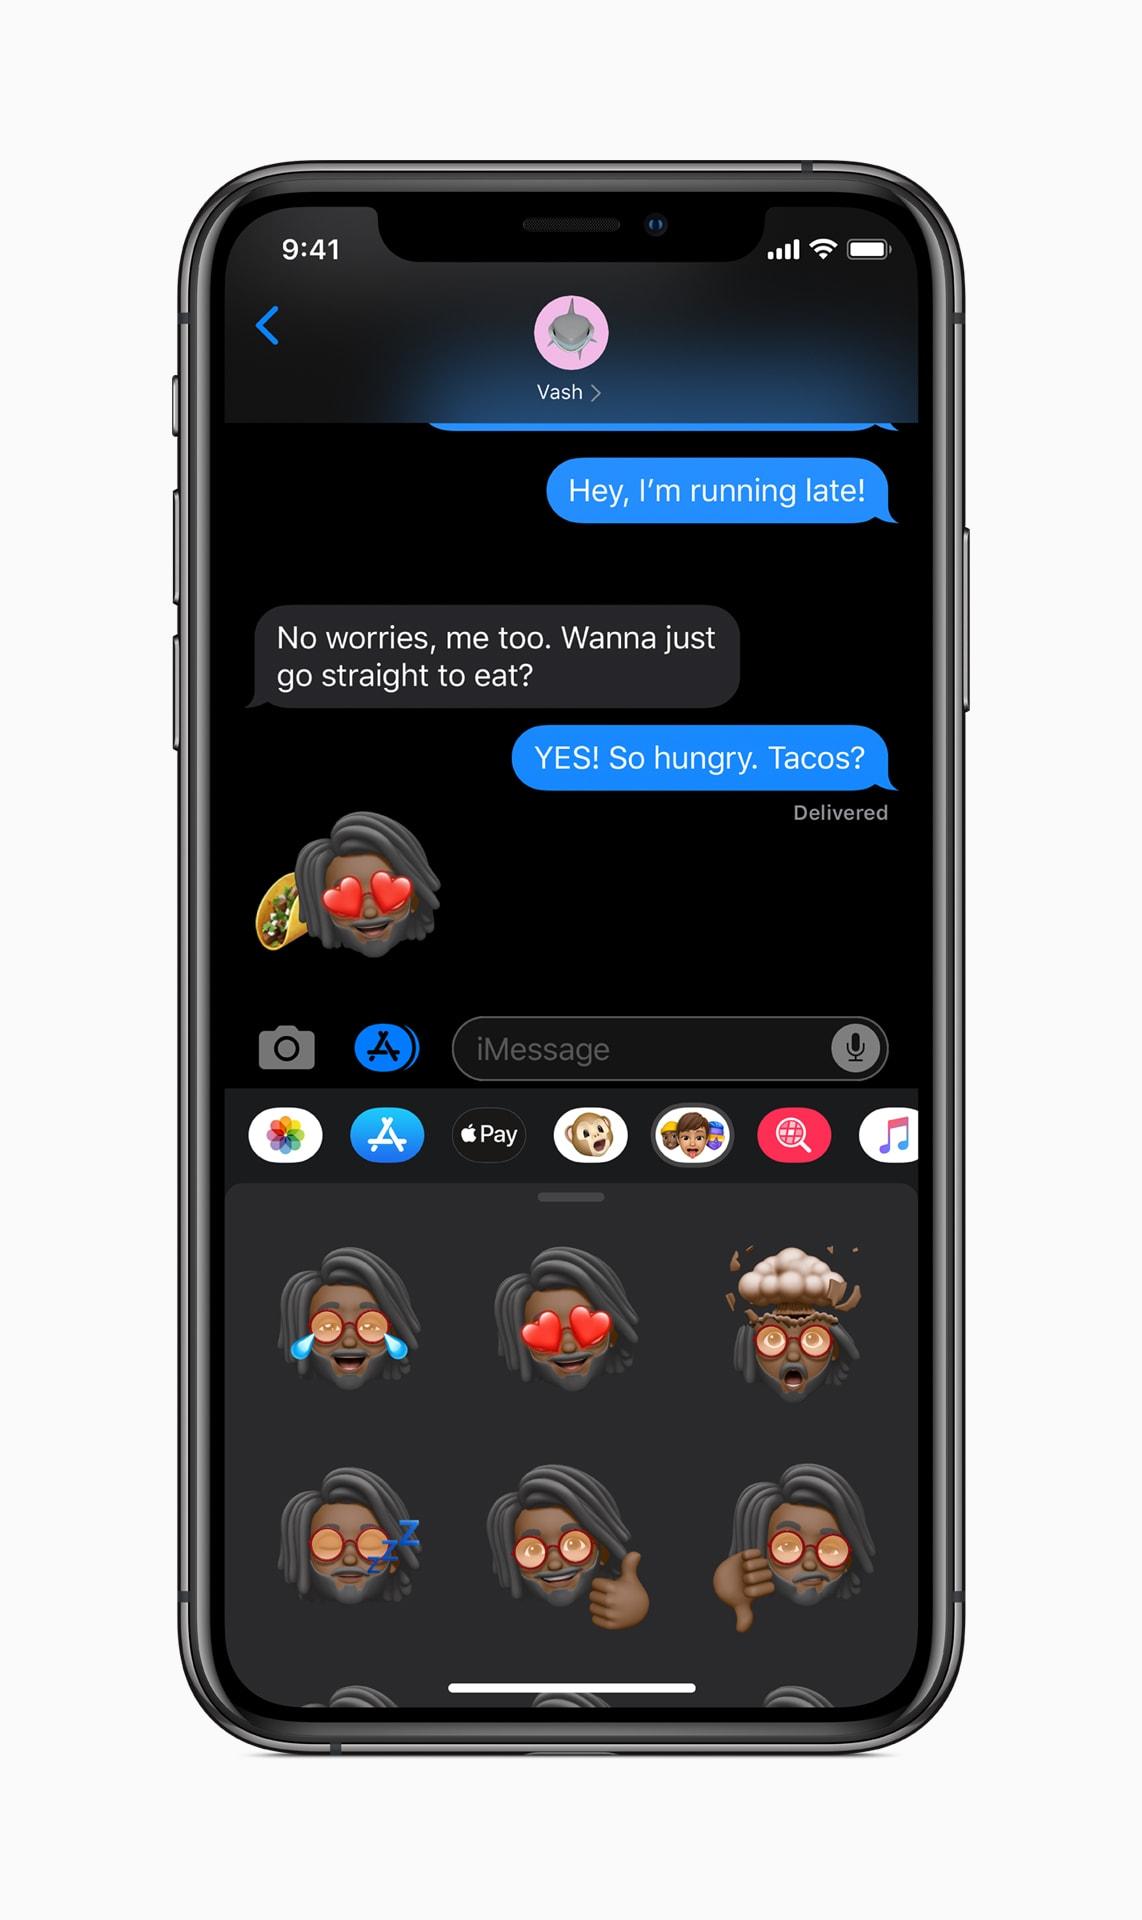 Memoji in iOS 13 Messaging app